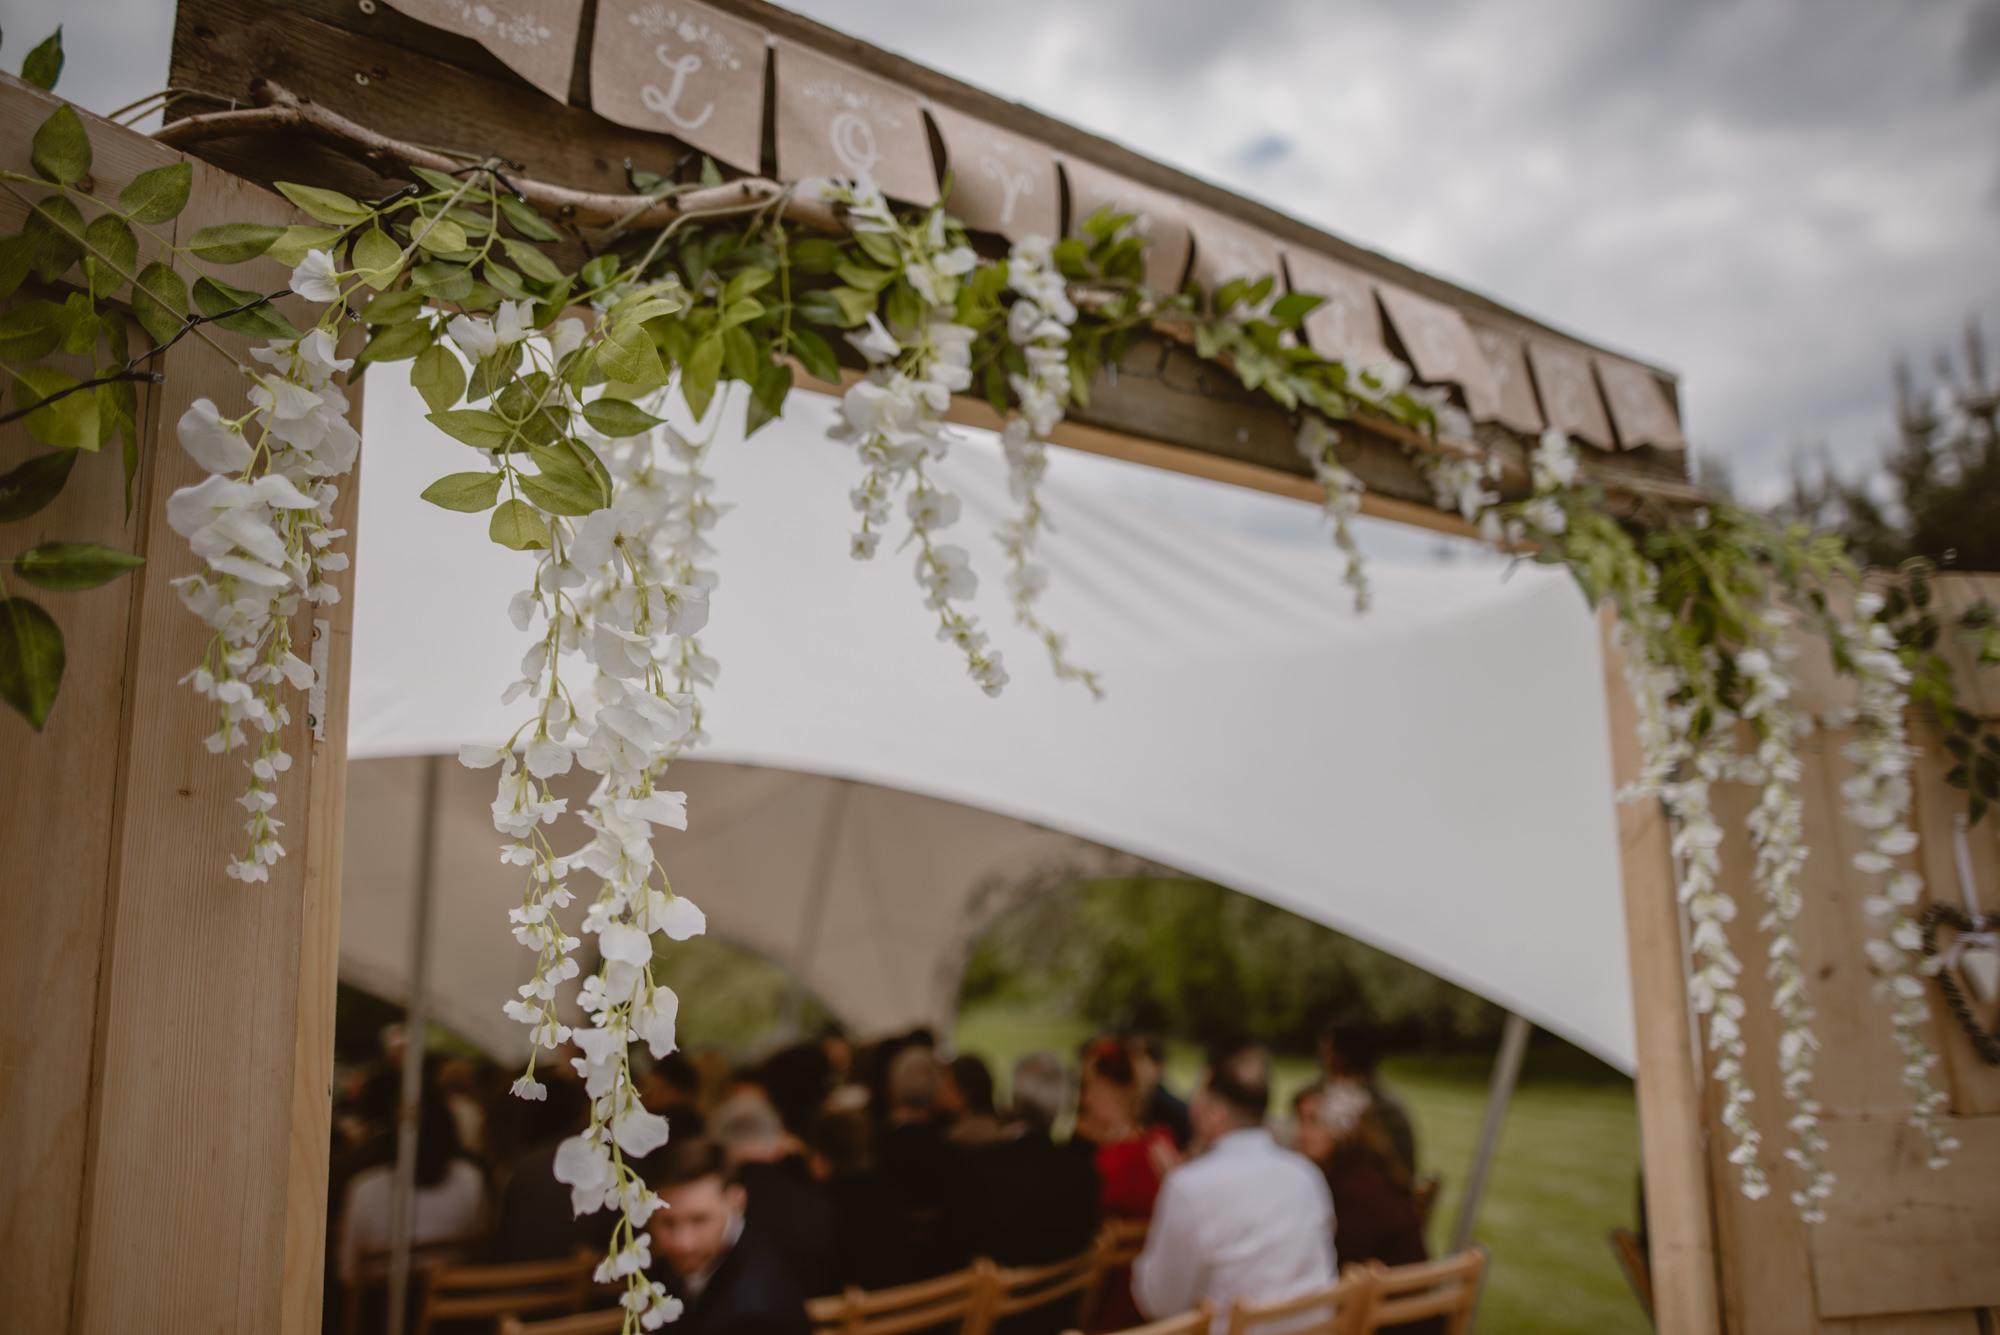 Jacqueline-Gareth-Wedding-Westmead-Events-Surrey-Manu-Mendoza-Wedding-Photography-148.jpg